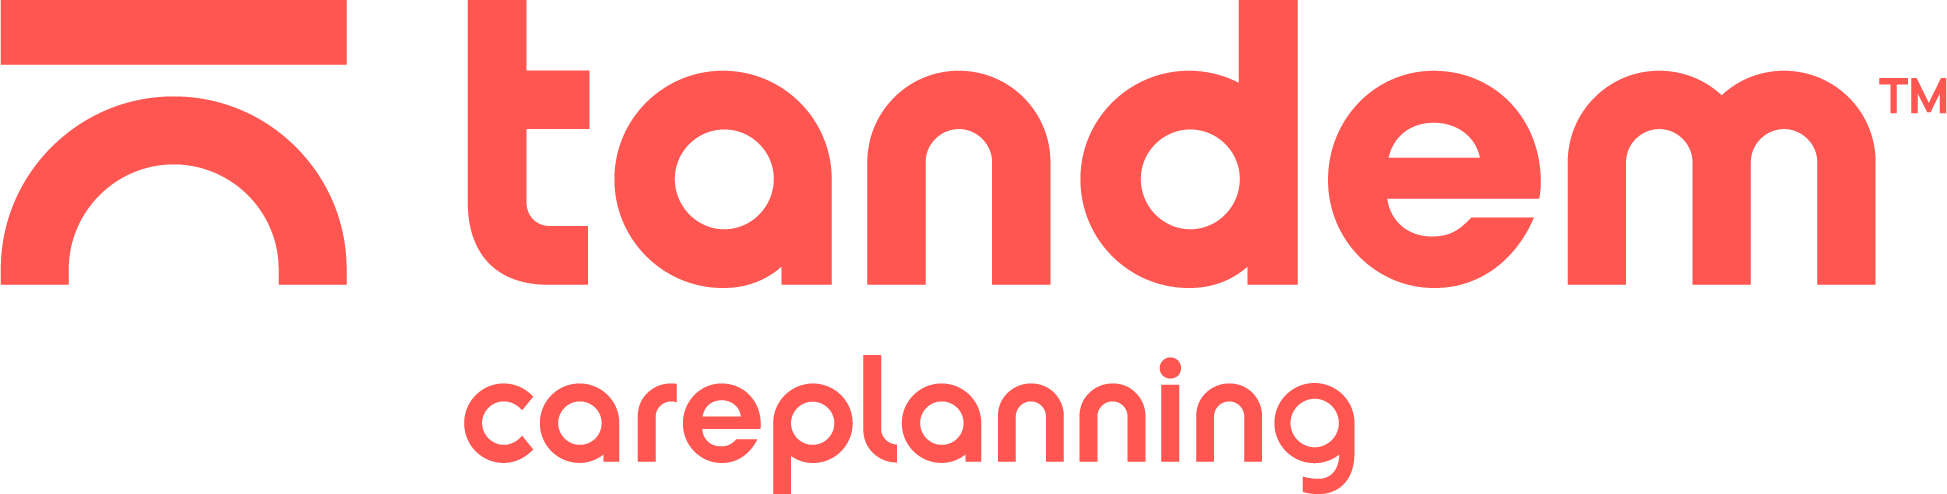 Tandem_Careplanning_Logo.png